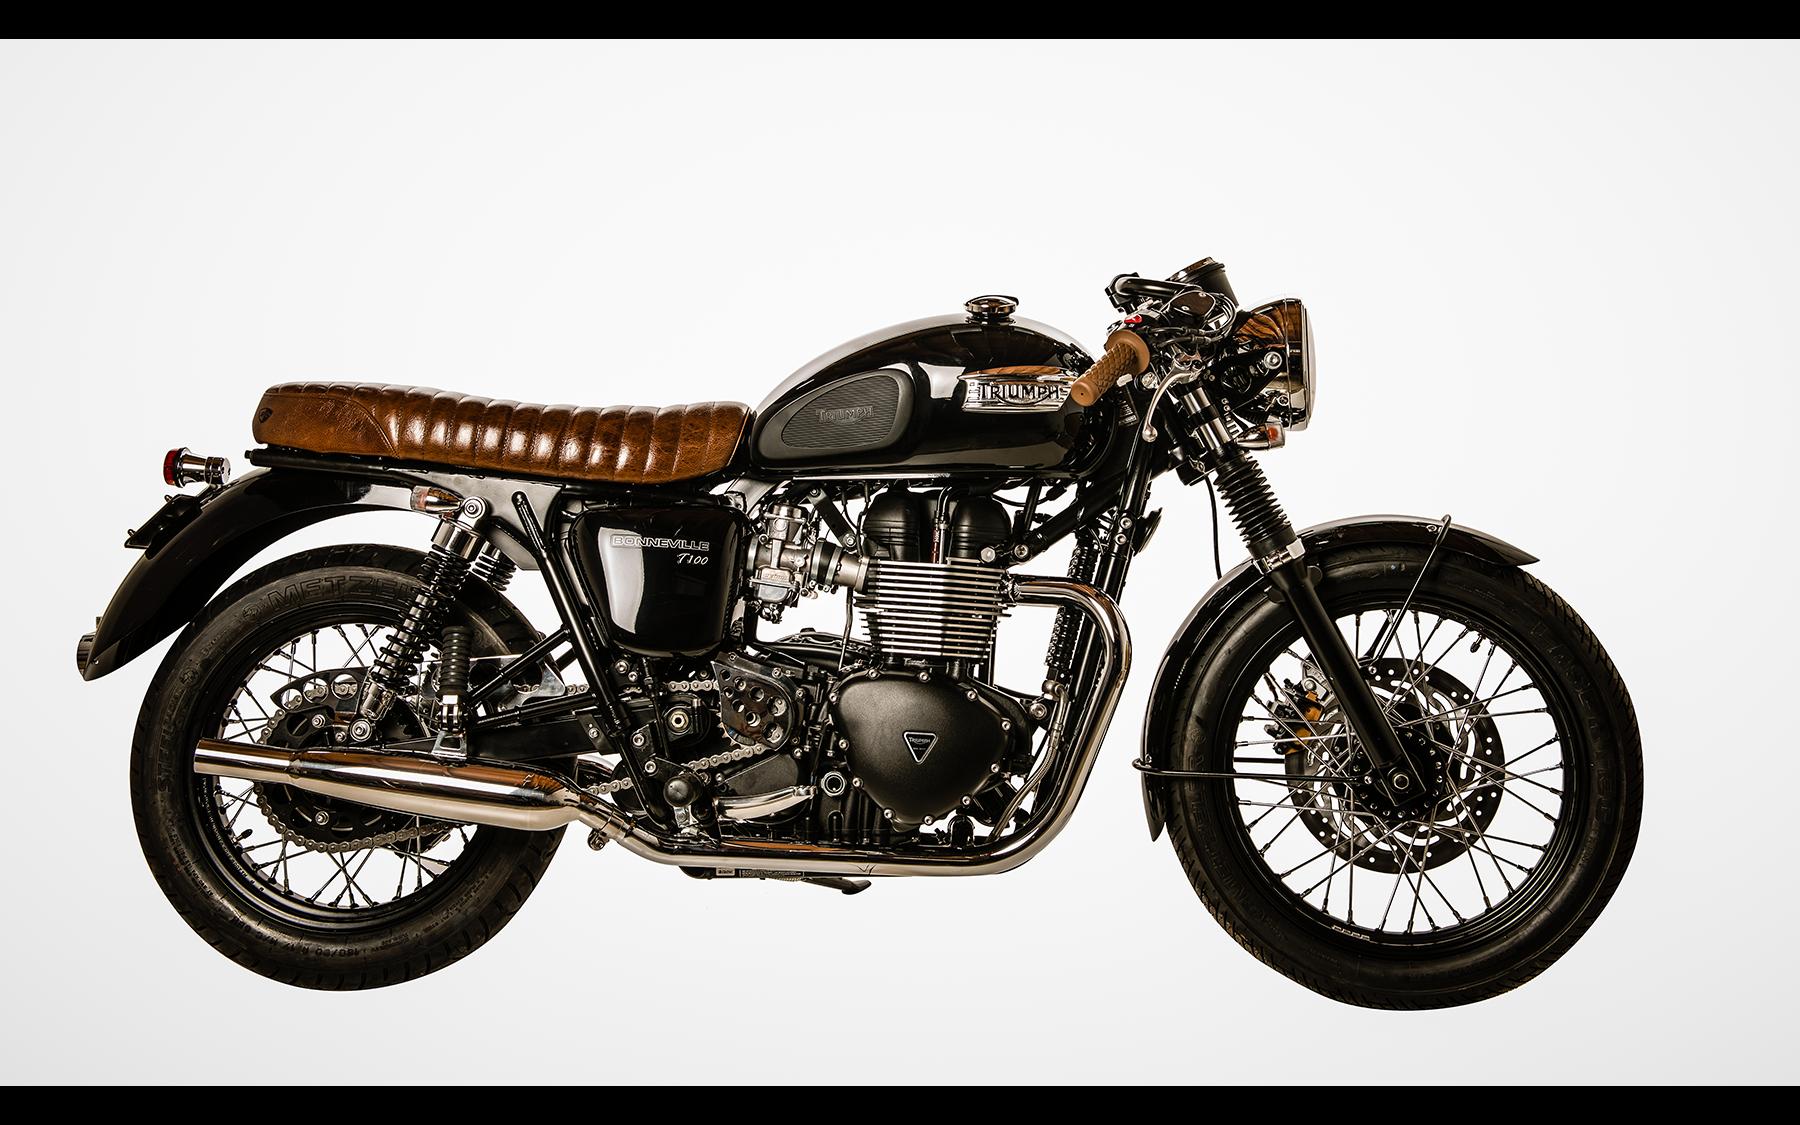 Triumph Bonneville Custom Black And Chrome By British Customs